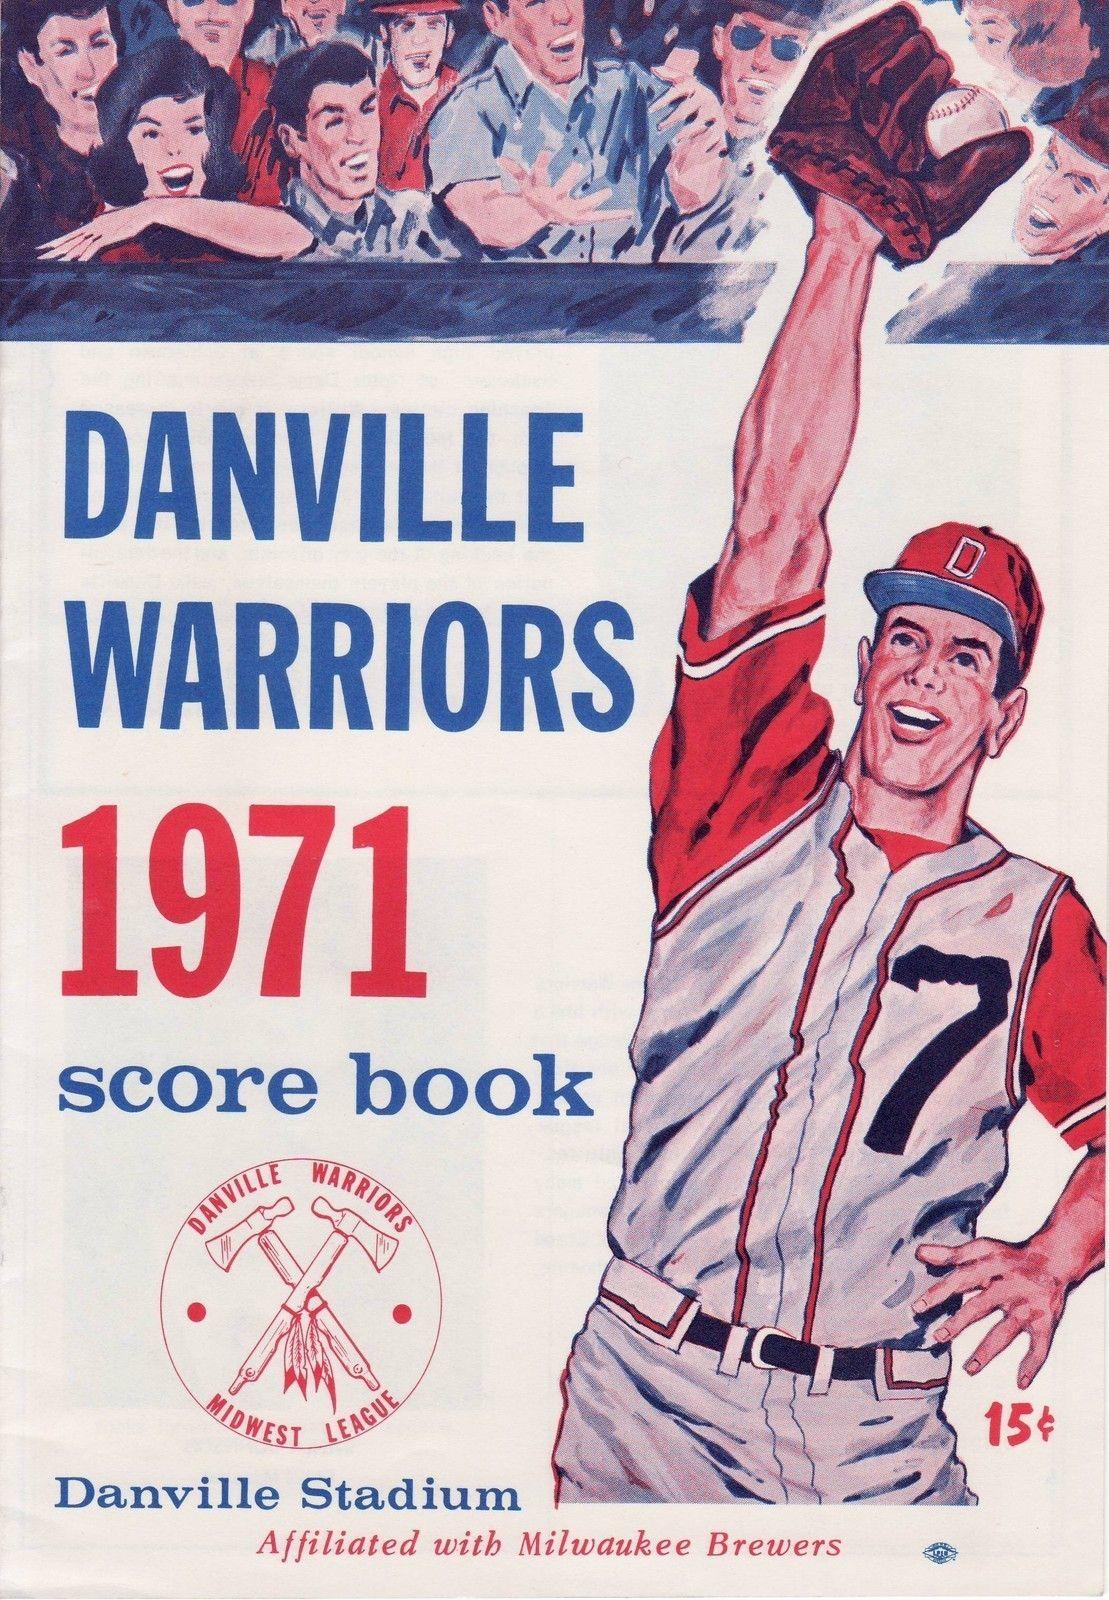 Danville, IL Danville Stadium Danville Warriors